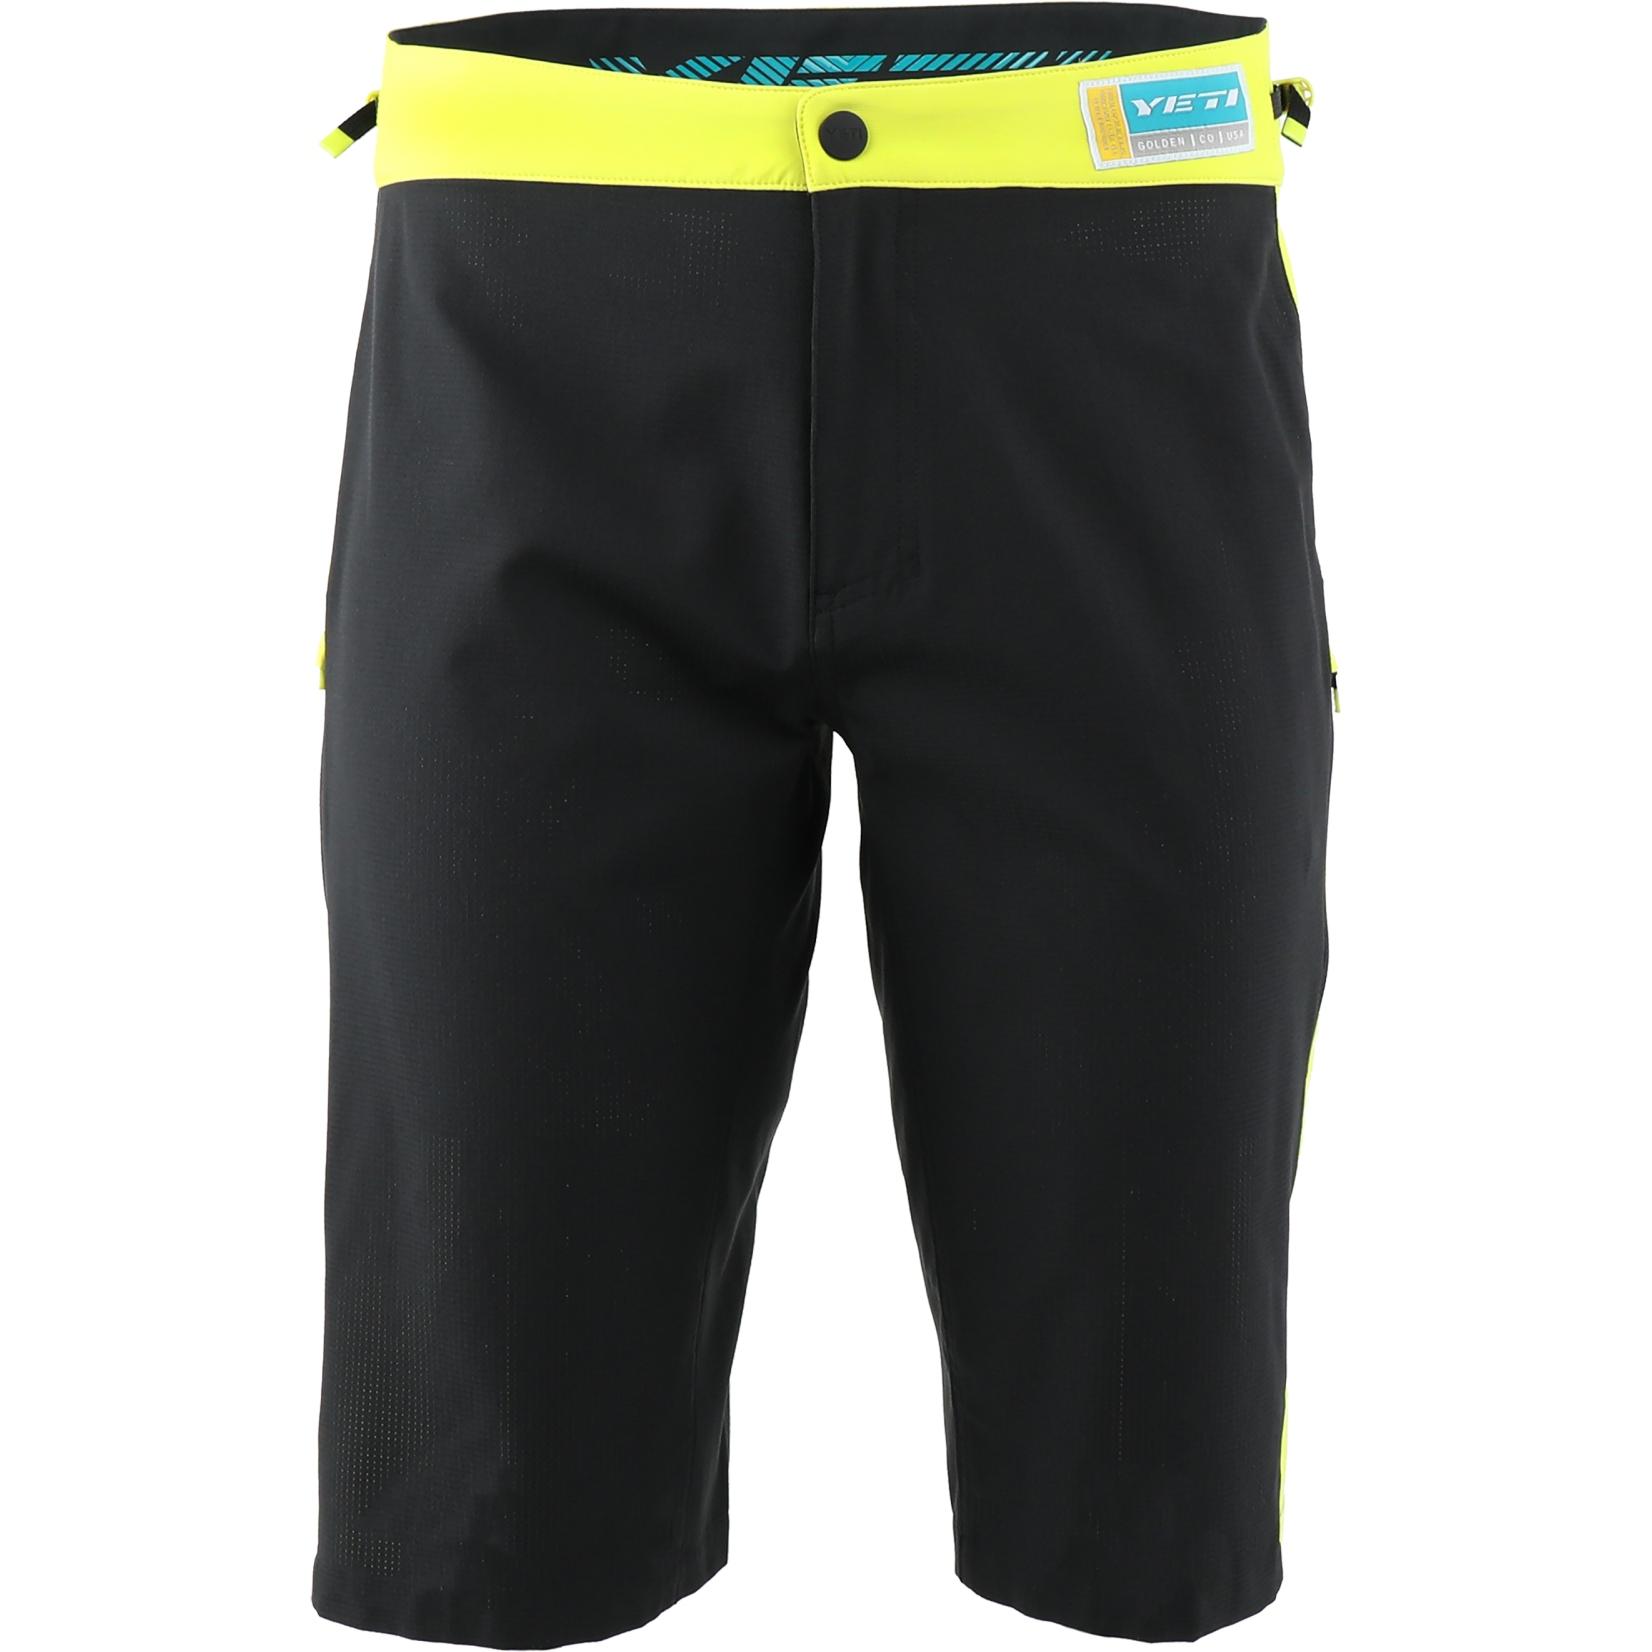 Yeti Cycles Enduro Shorts - Lime